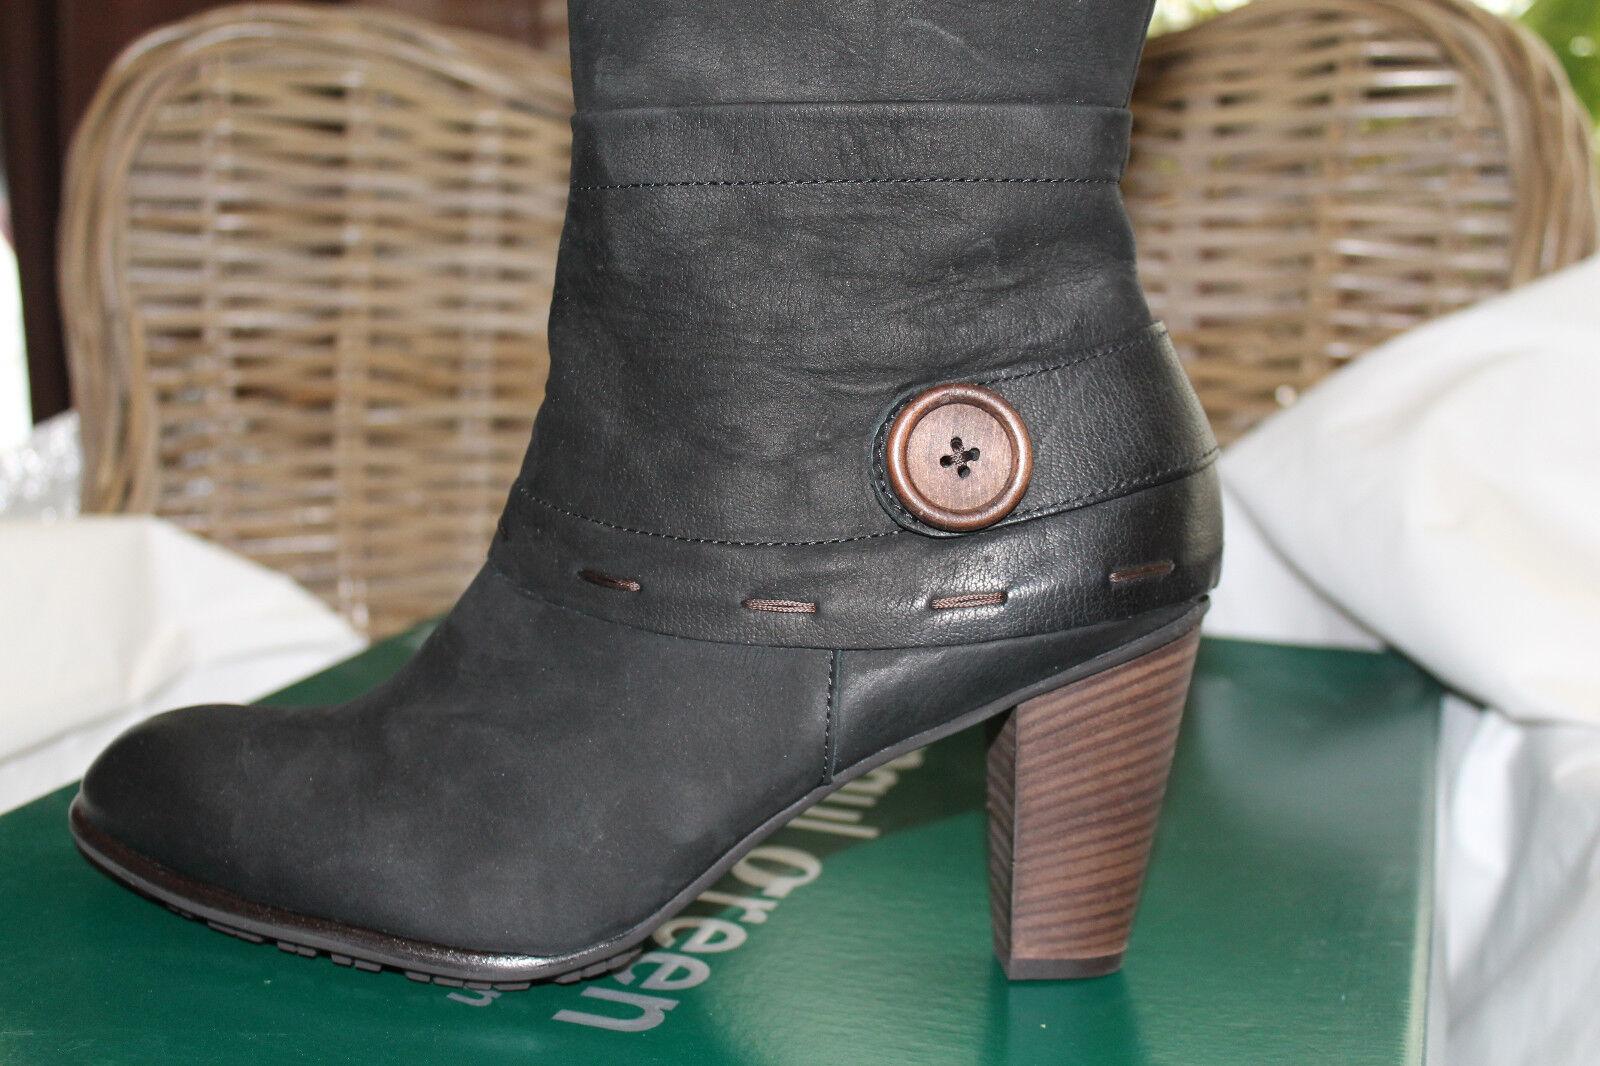 PAUL GREEN Stiefel Größe: 39 -neu- (6) Farbe: schwarz Nubukleder -neu- 39 49dfc5